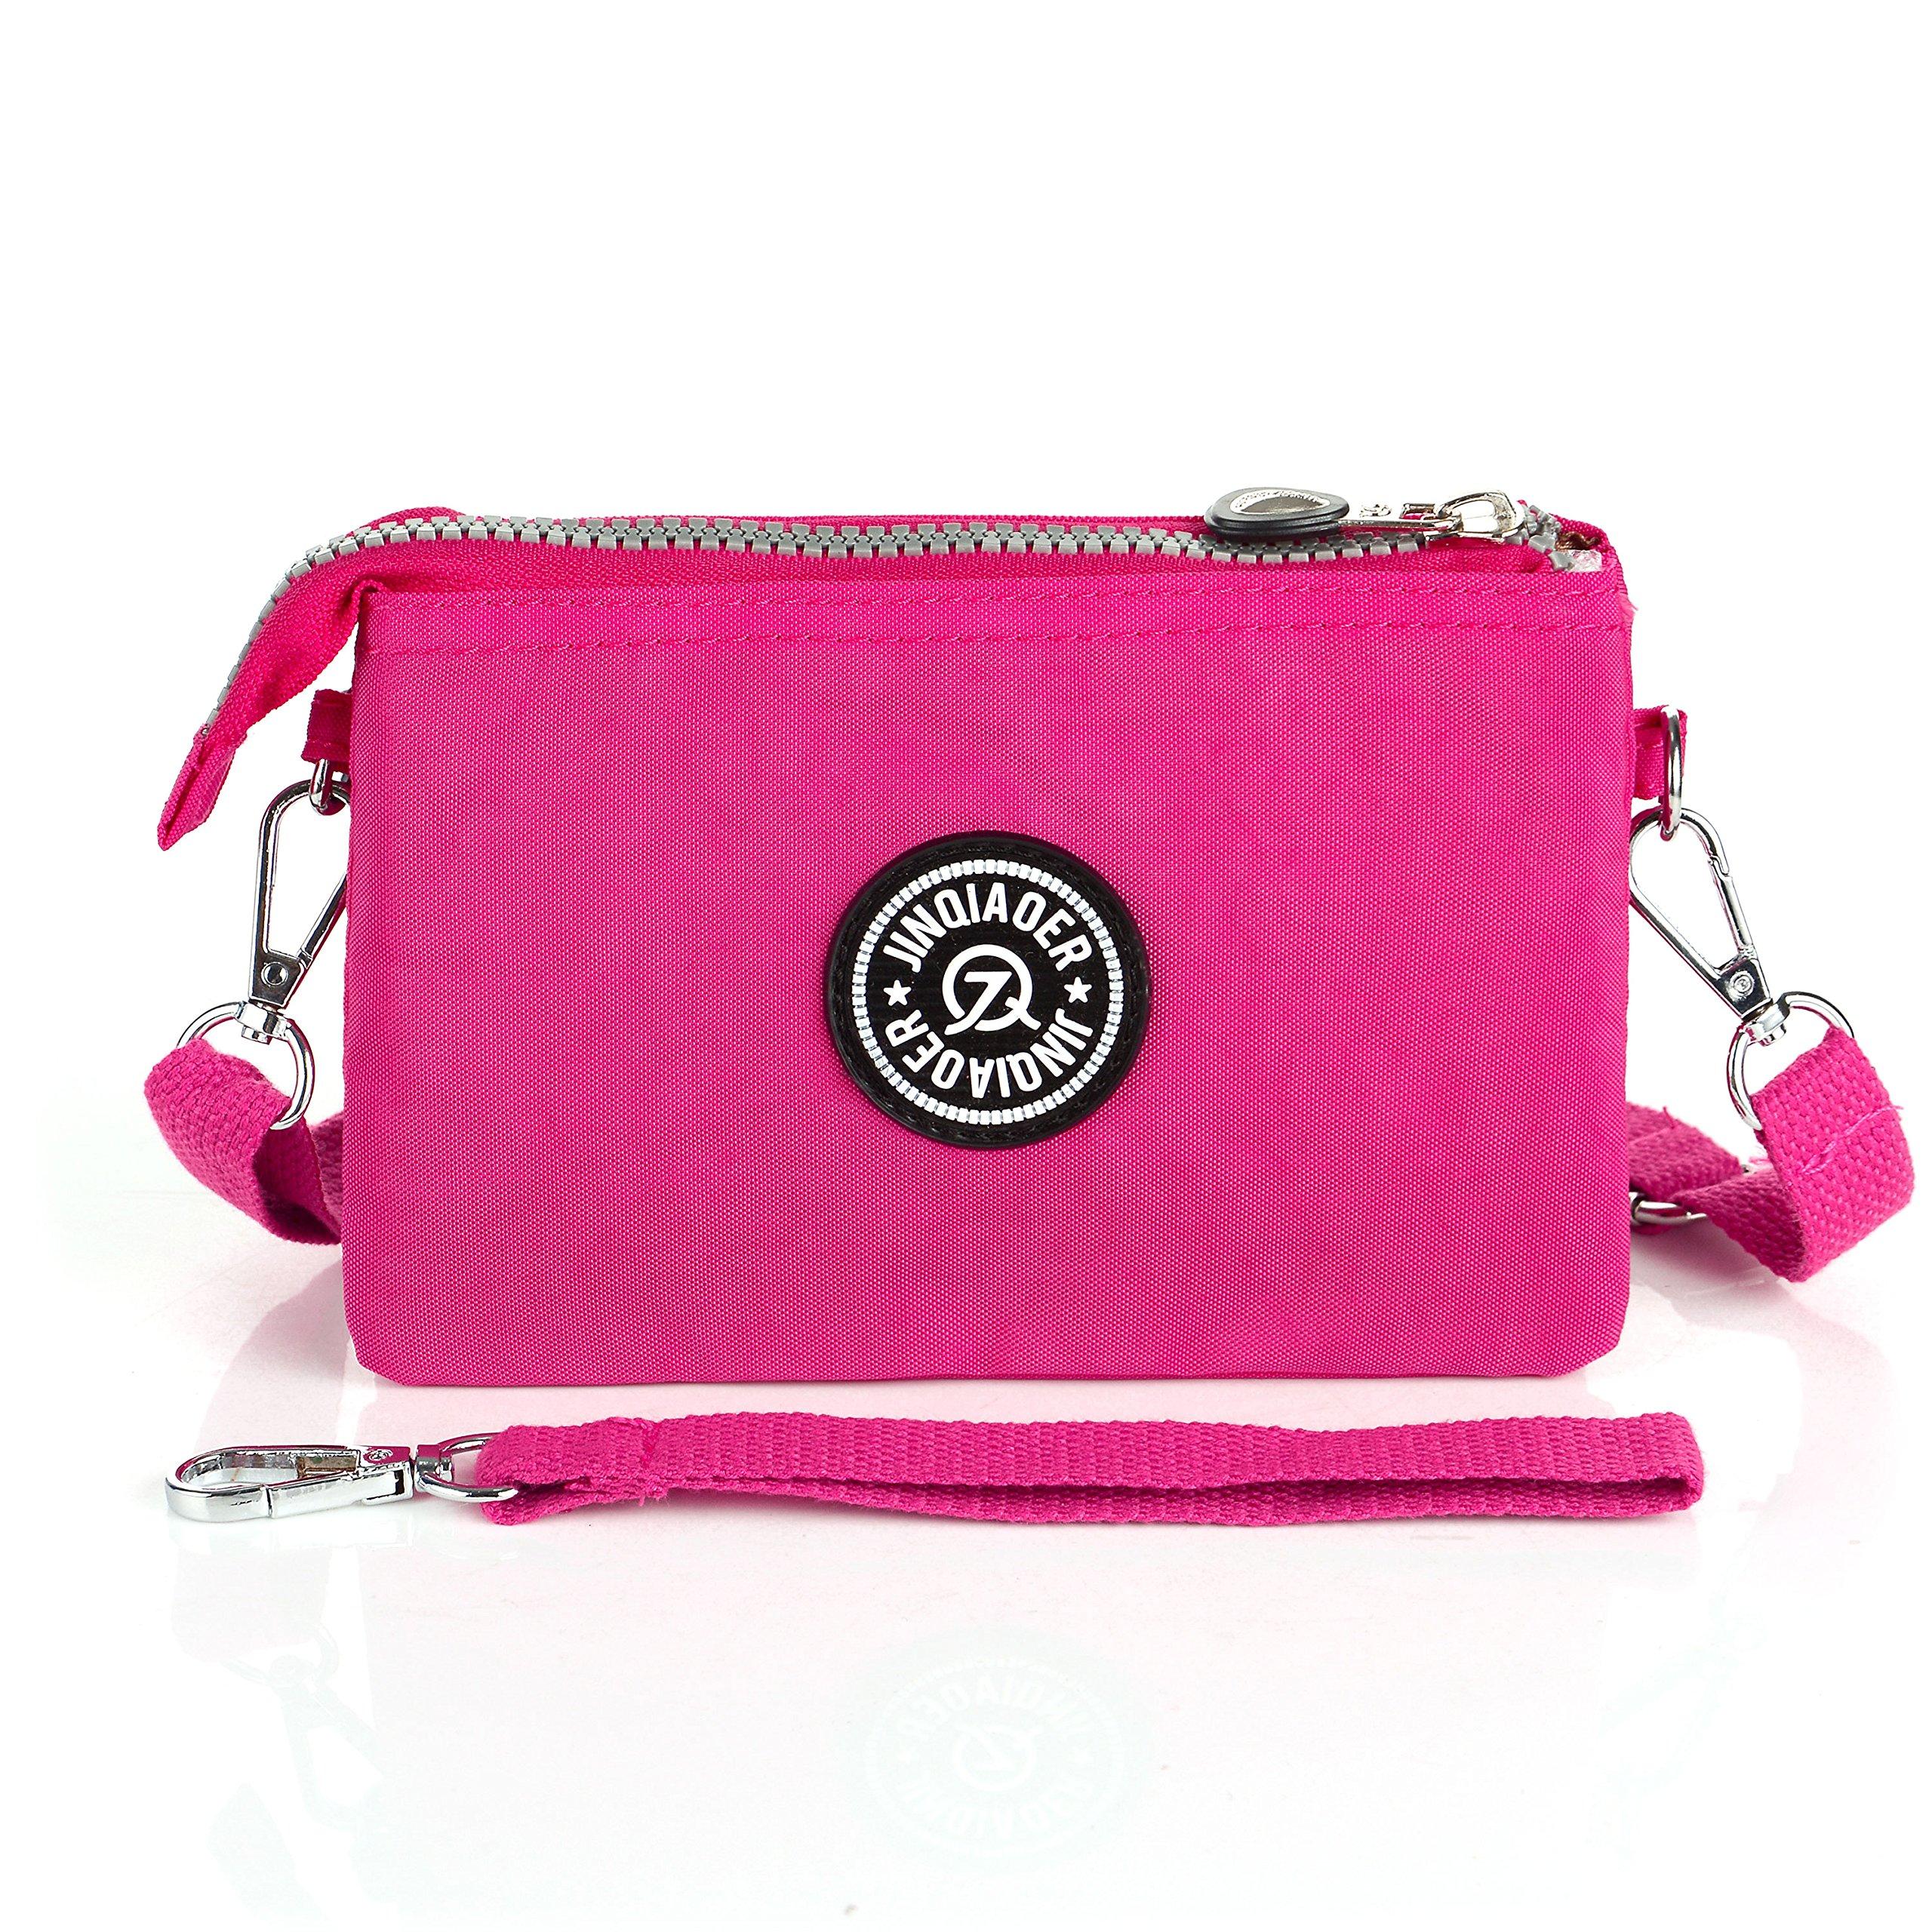 Ladies Wrist Handbag Wristlet Shoulder Bag Girls Water Resistant Nylon Multipurpose Phone Purse 3 Layers 2 Way(Rose Red)